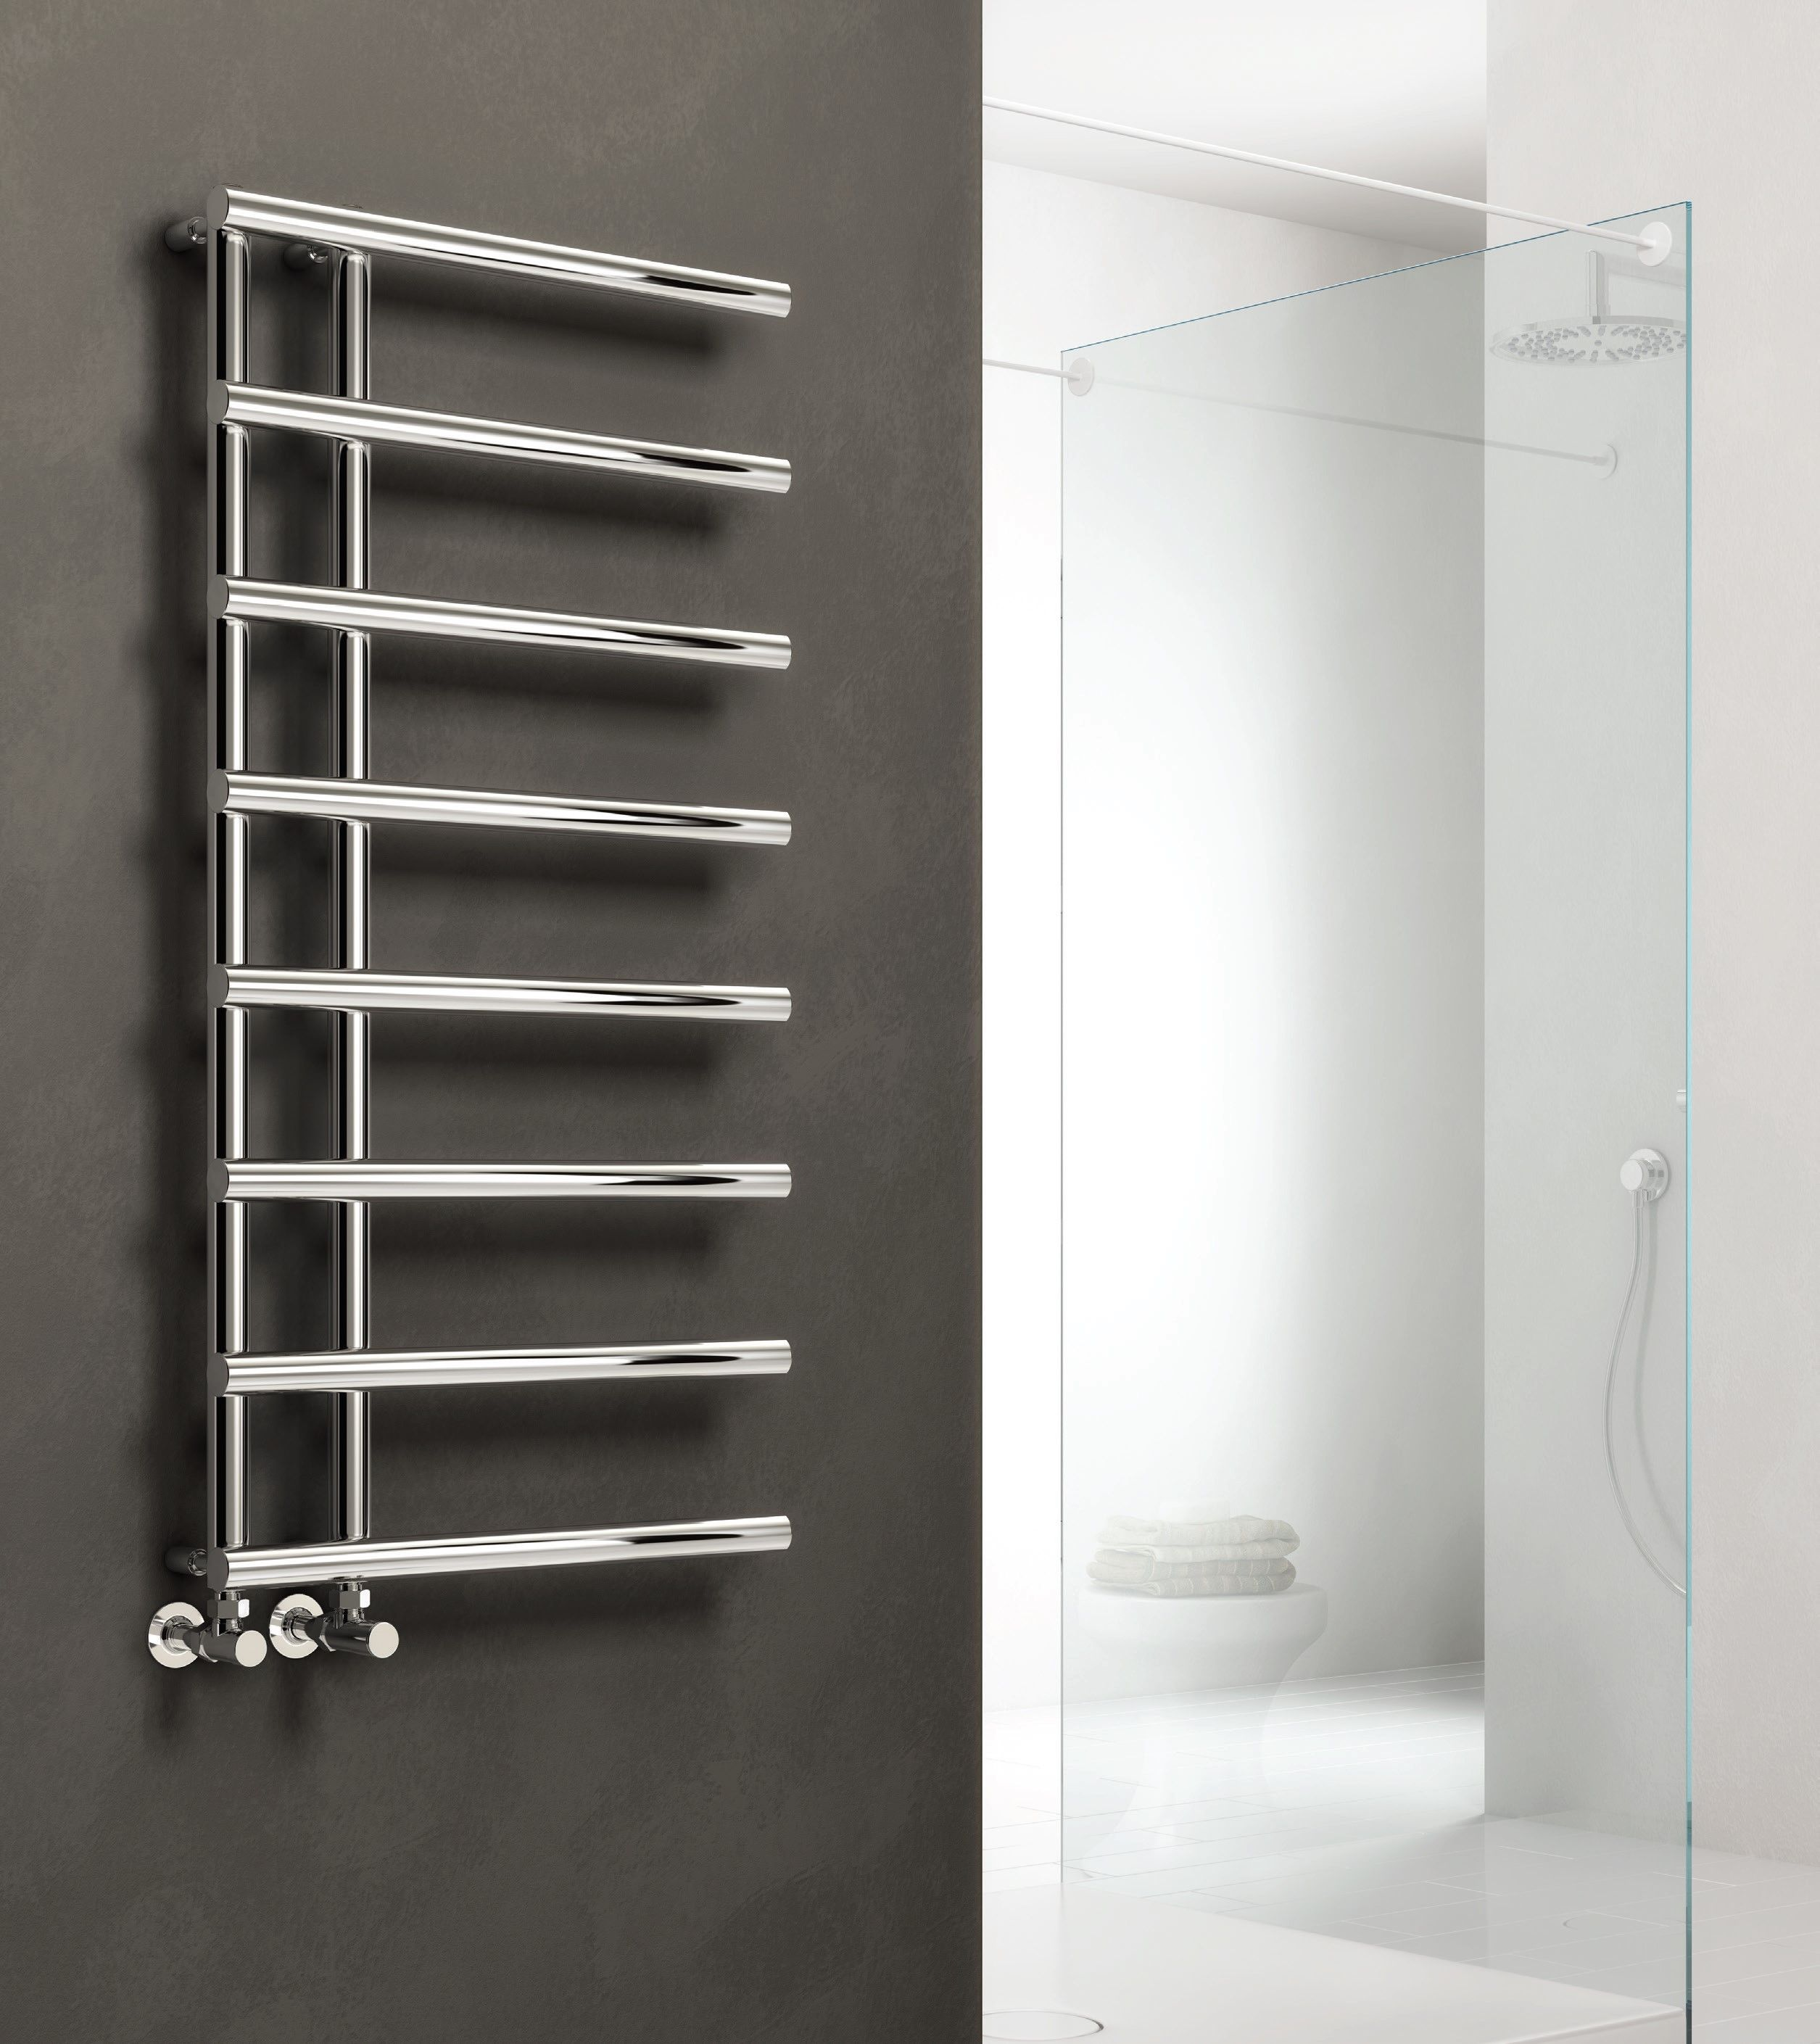 Modern Designer Chrome Straight Round Heated Towel Rail Bathroom Radiator Reina Towel Radiator Heated Towel Rail Bathroom Radiators